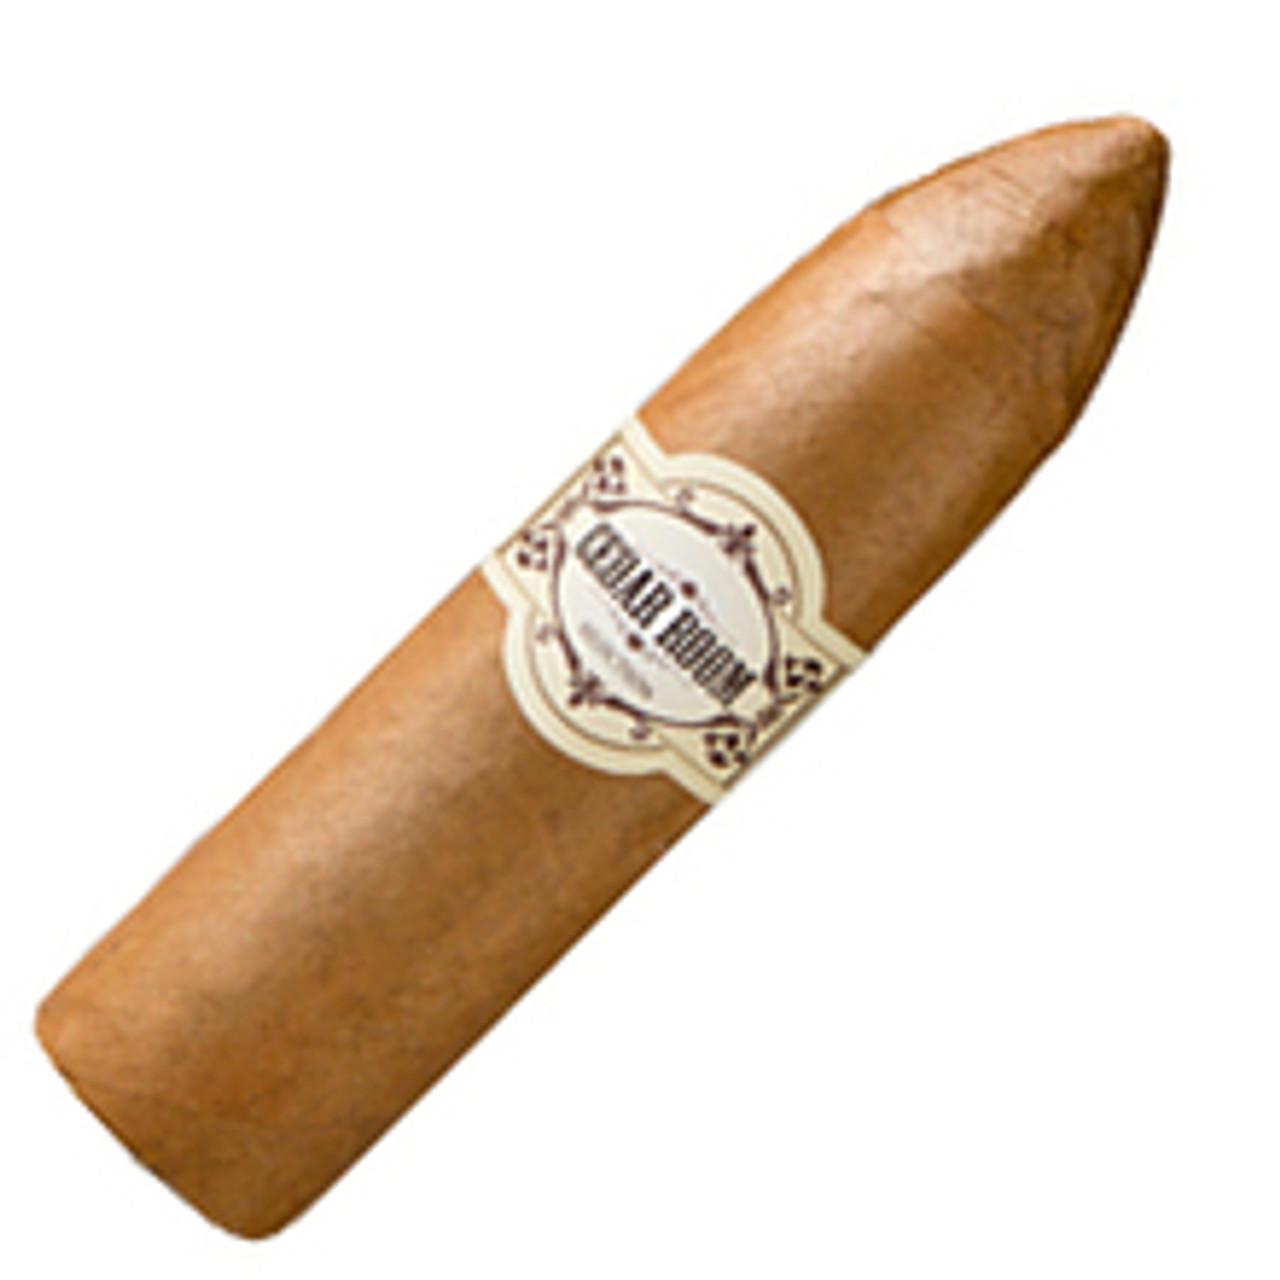 Cedar Room Connecticut Ecuadorian Short Magnum Cigars - 4 x 60 (Pack of 5)